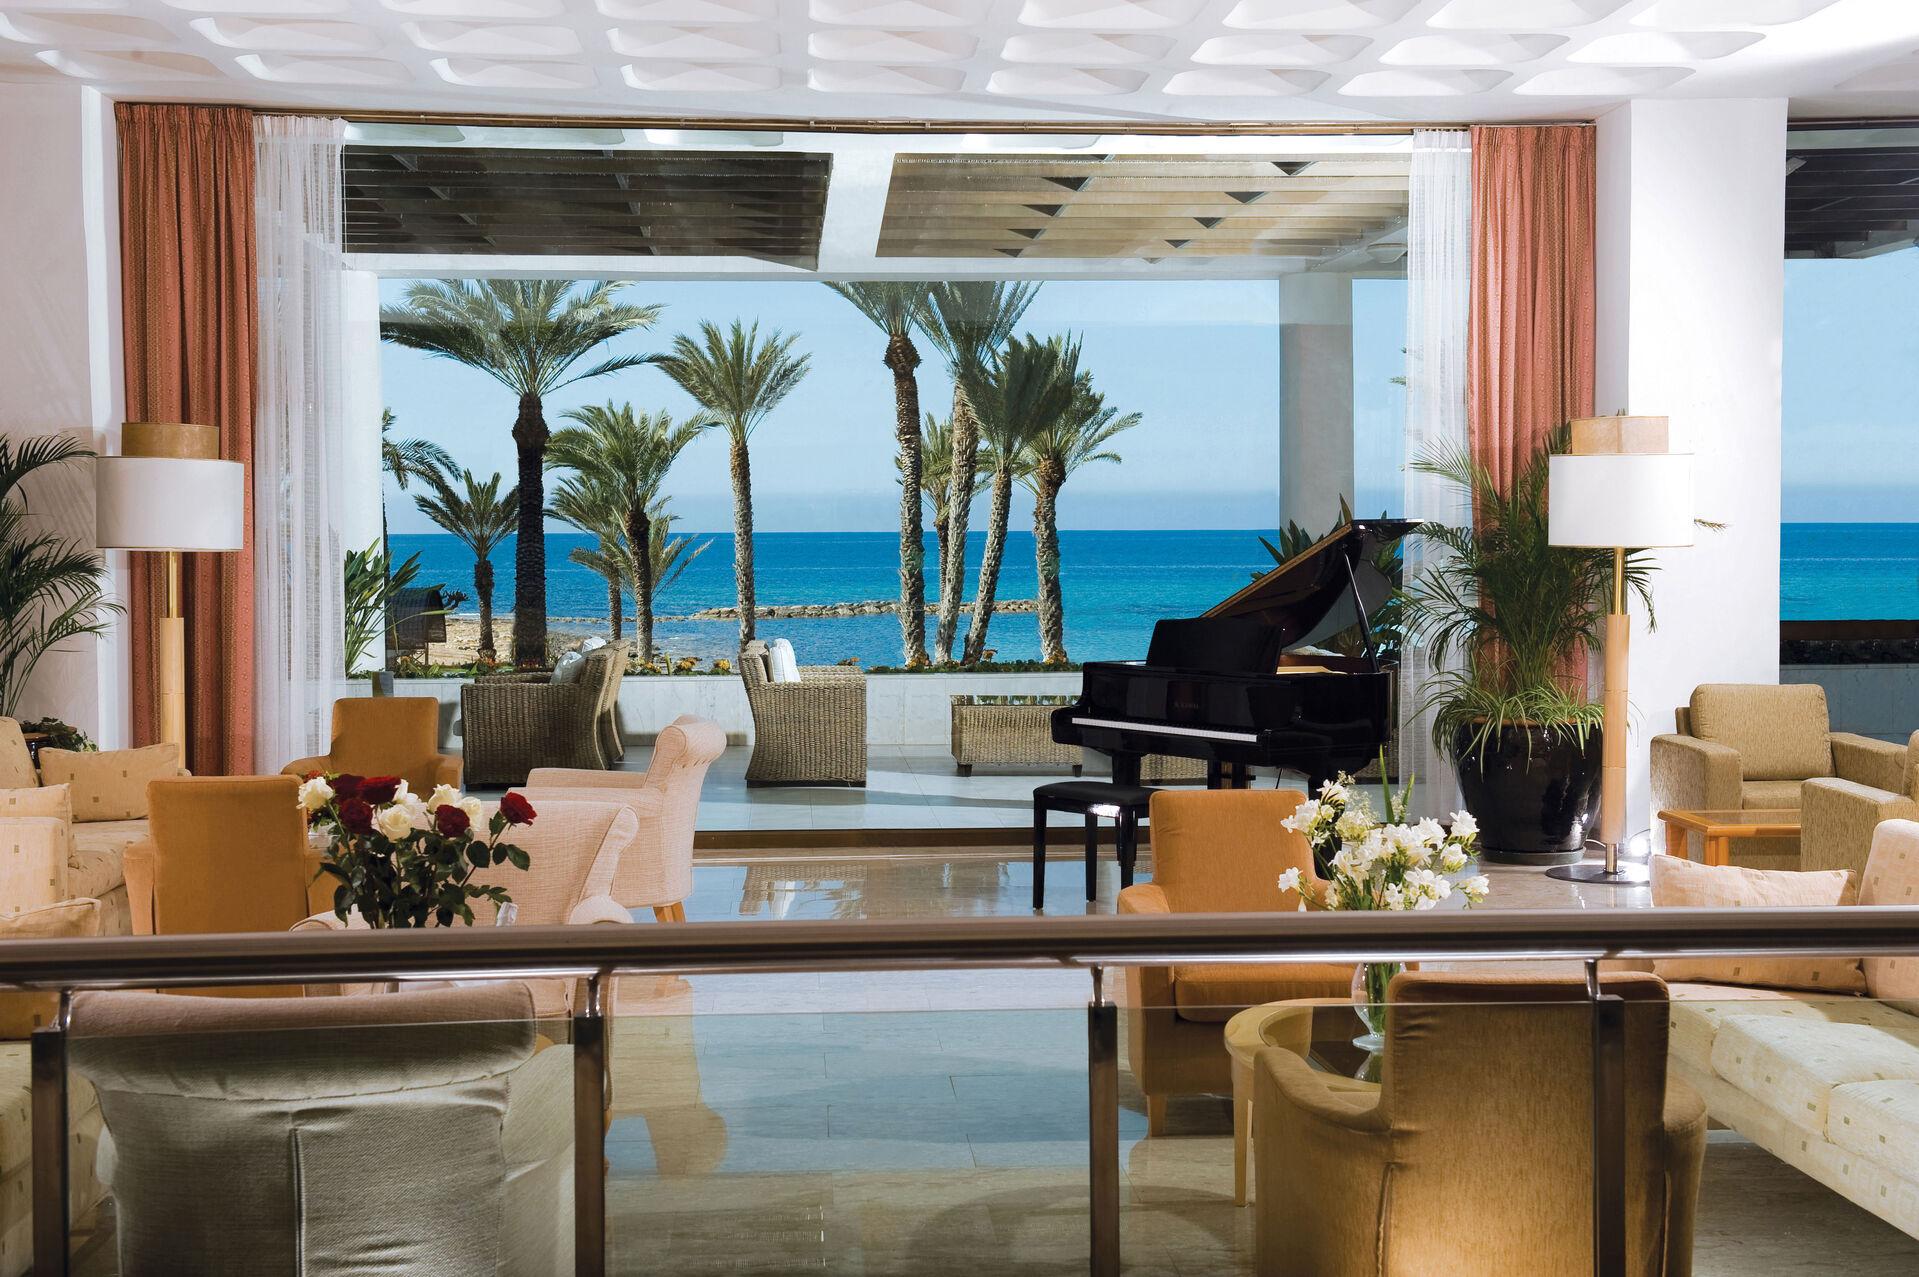 https://cms.satur.sk/data/imgs/tour_image/orig/03-1-pioneer-beach-hotel-lobby-1972632.jpg